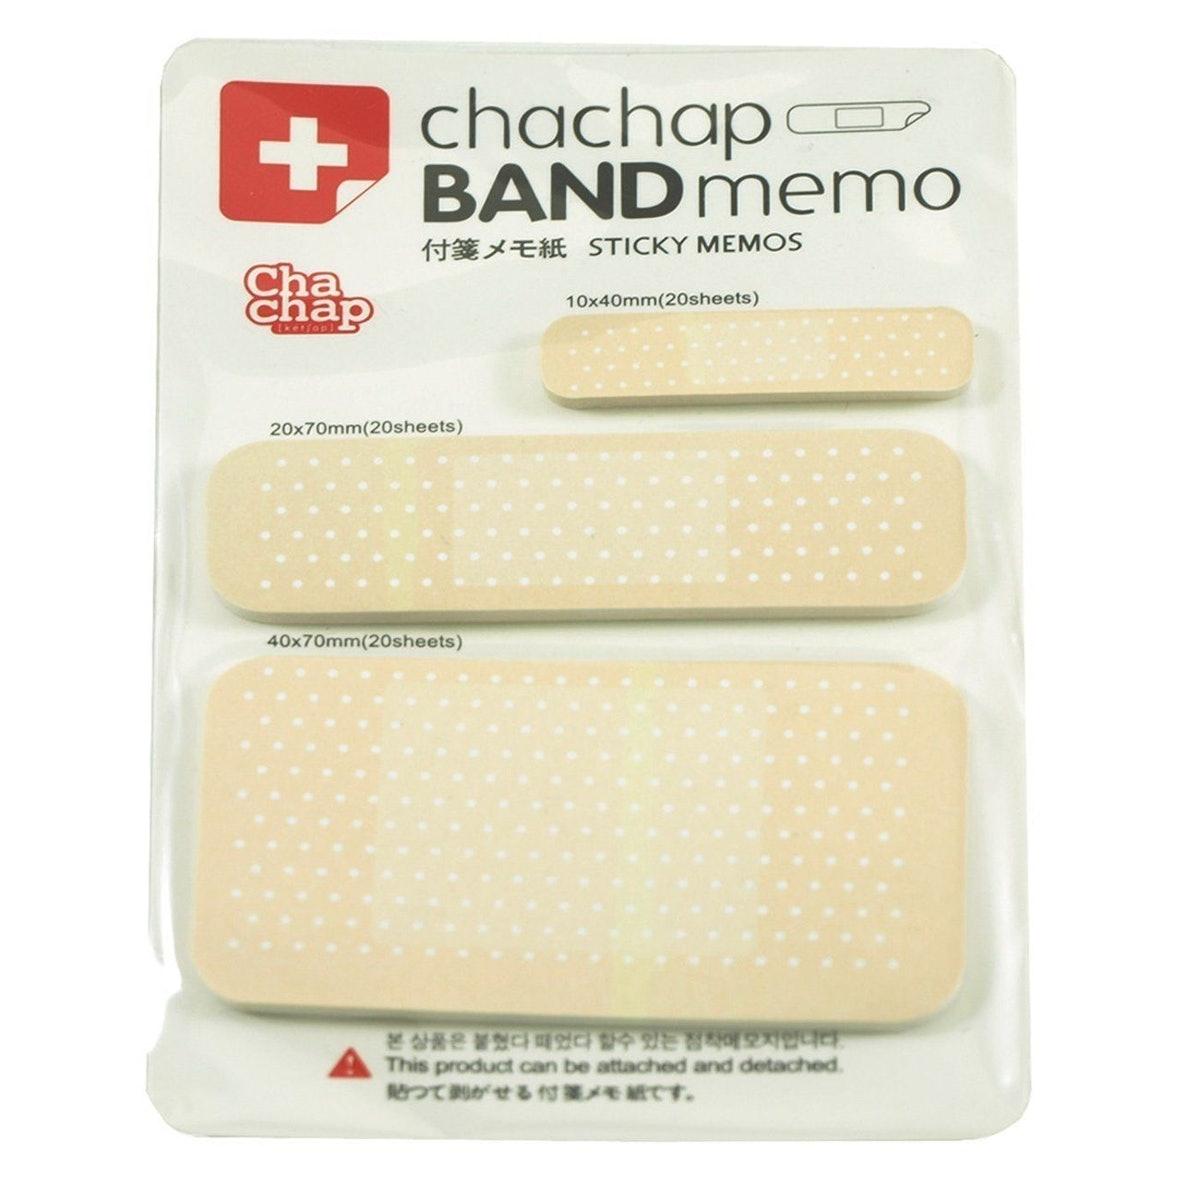 Wrapables Bandage Sticky Notes